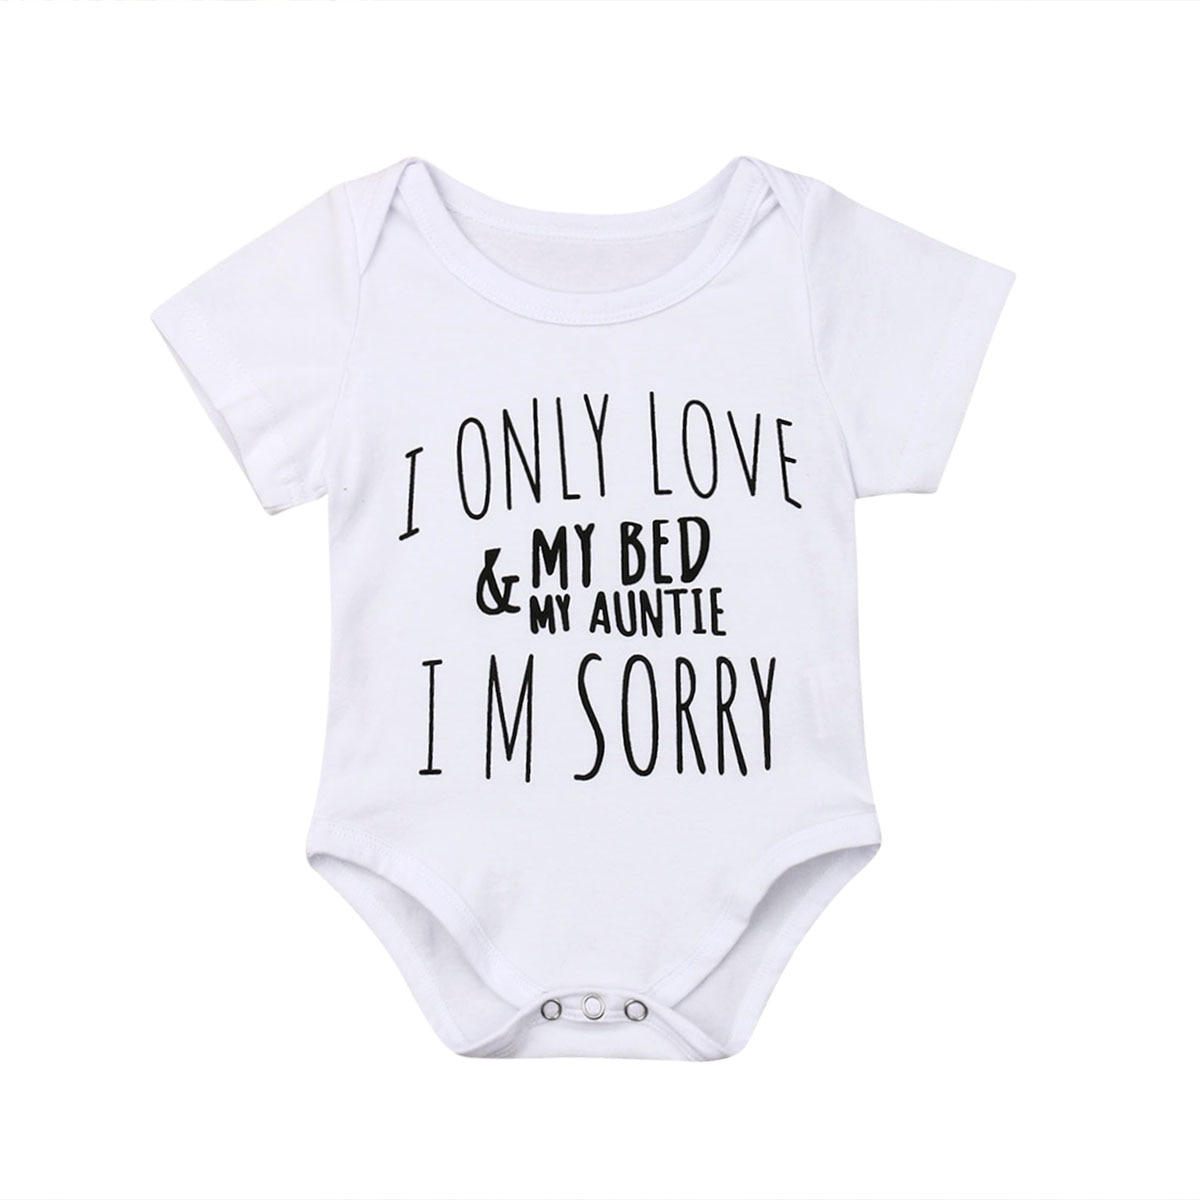 0-18M Kid Roupas Bebê Recém-nascido Menino Menina AMO MINHA TIA Sunsuit Bodysuit Manga Curta Jumper Outfits